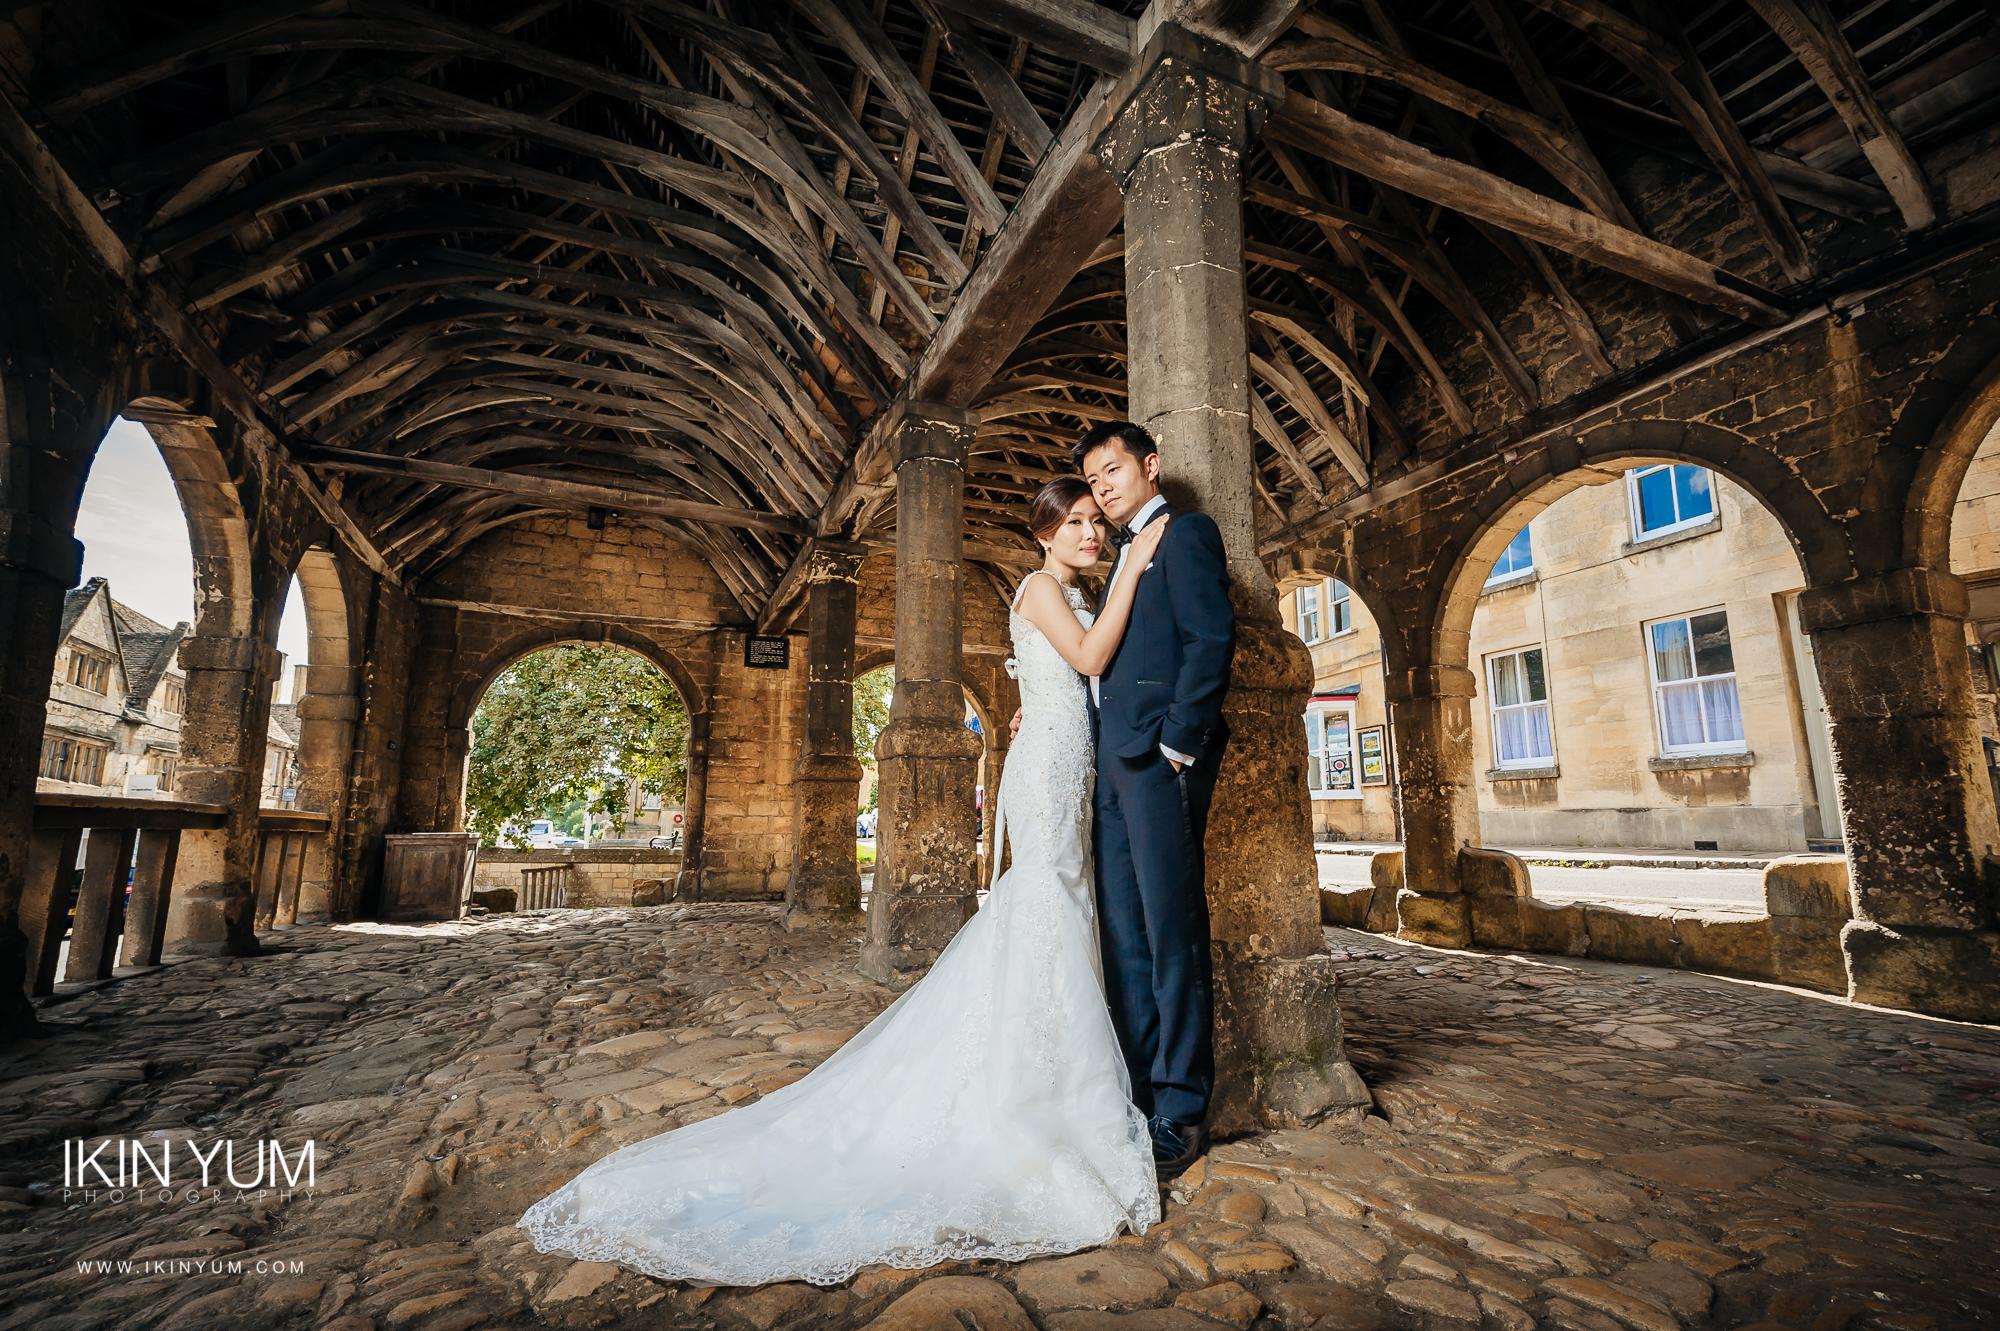 Carmen & Dennis Pre-Wedding Shoot - Ikin Yum Photography-056.jpg